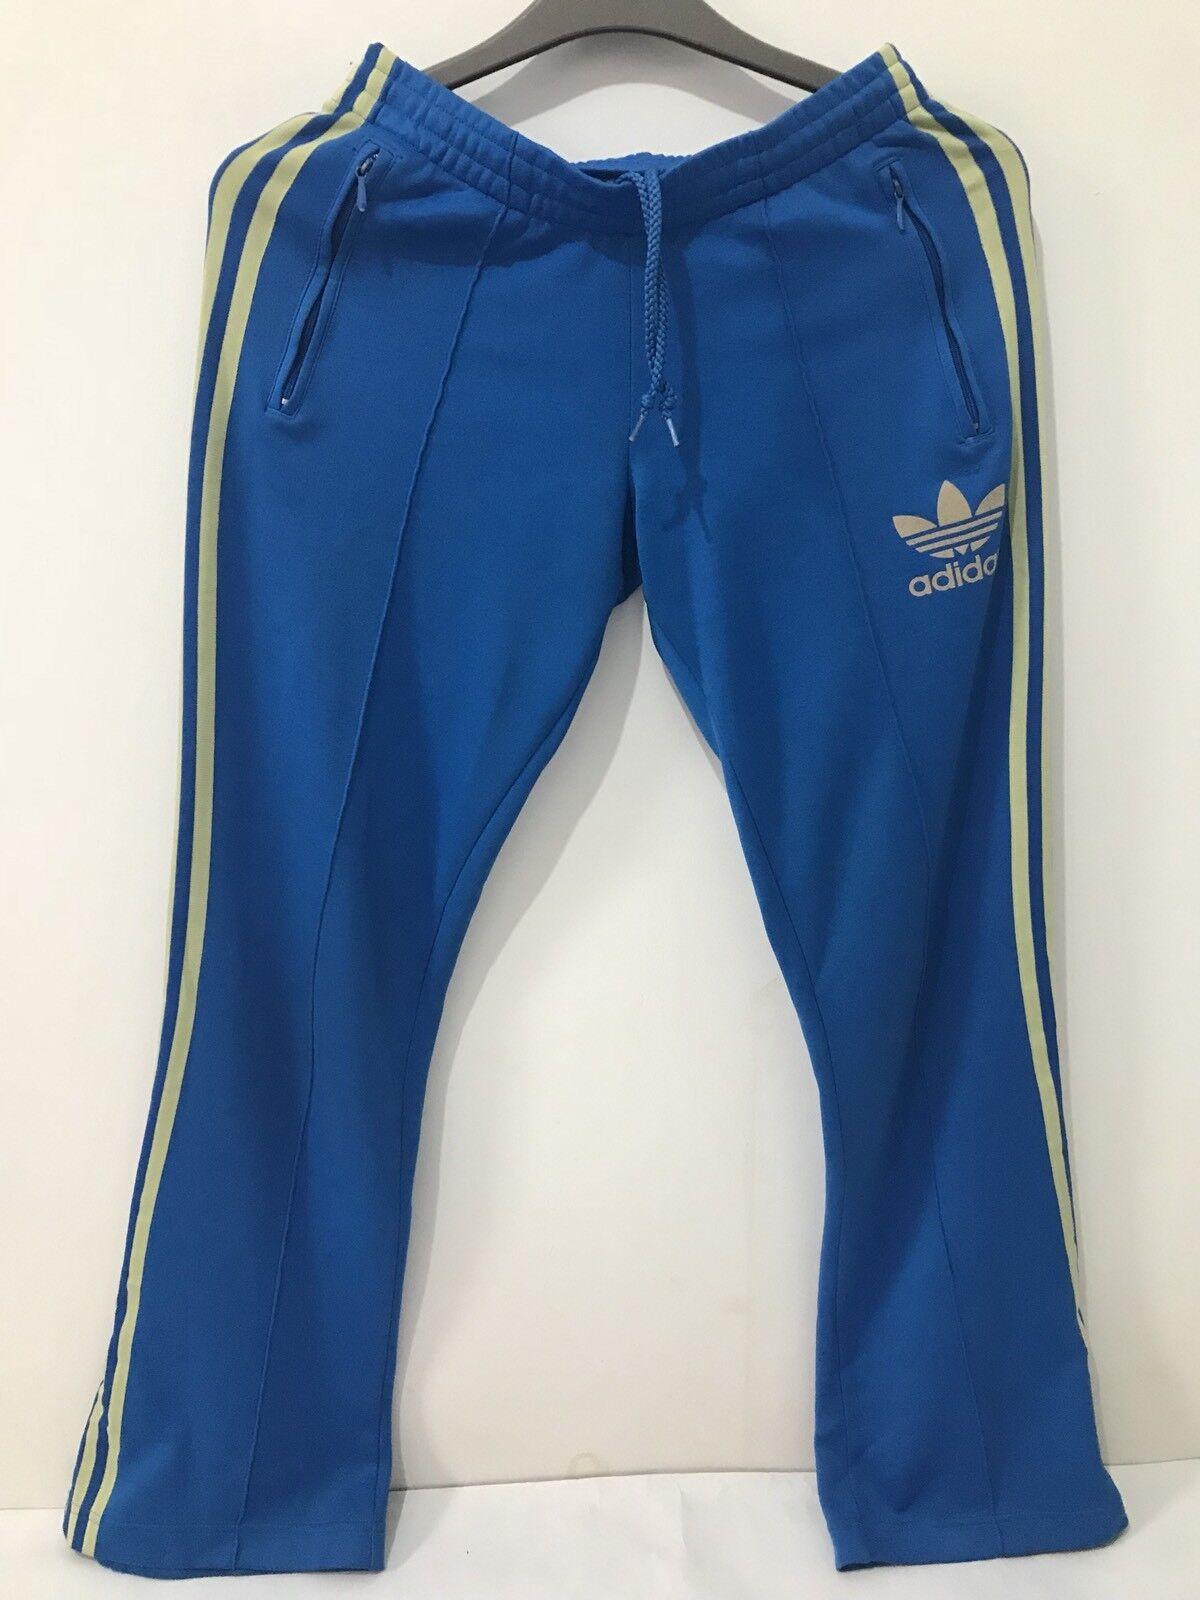 Pantalon Débardeur Taille Rayures Bleu Adidas Survêtement Femmes 3 qvXvxSw7O